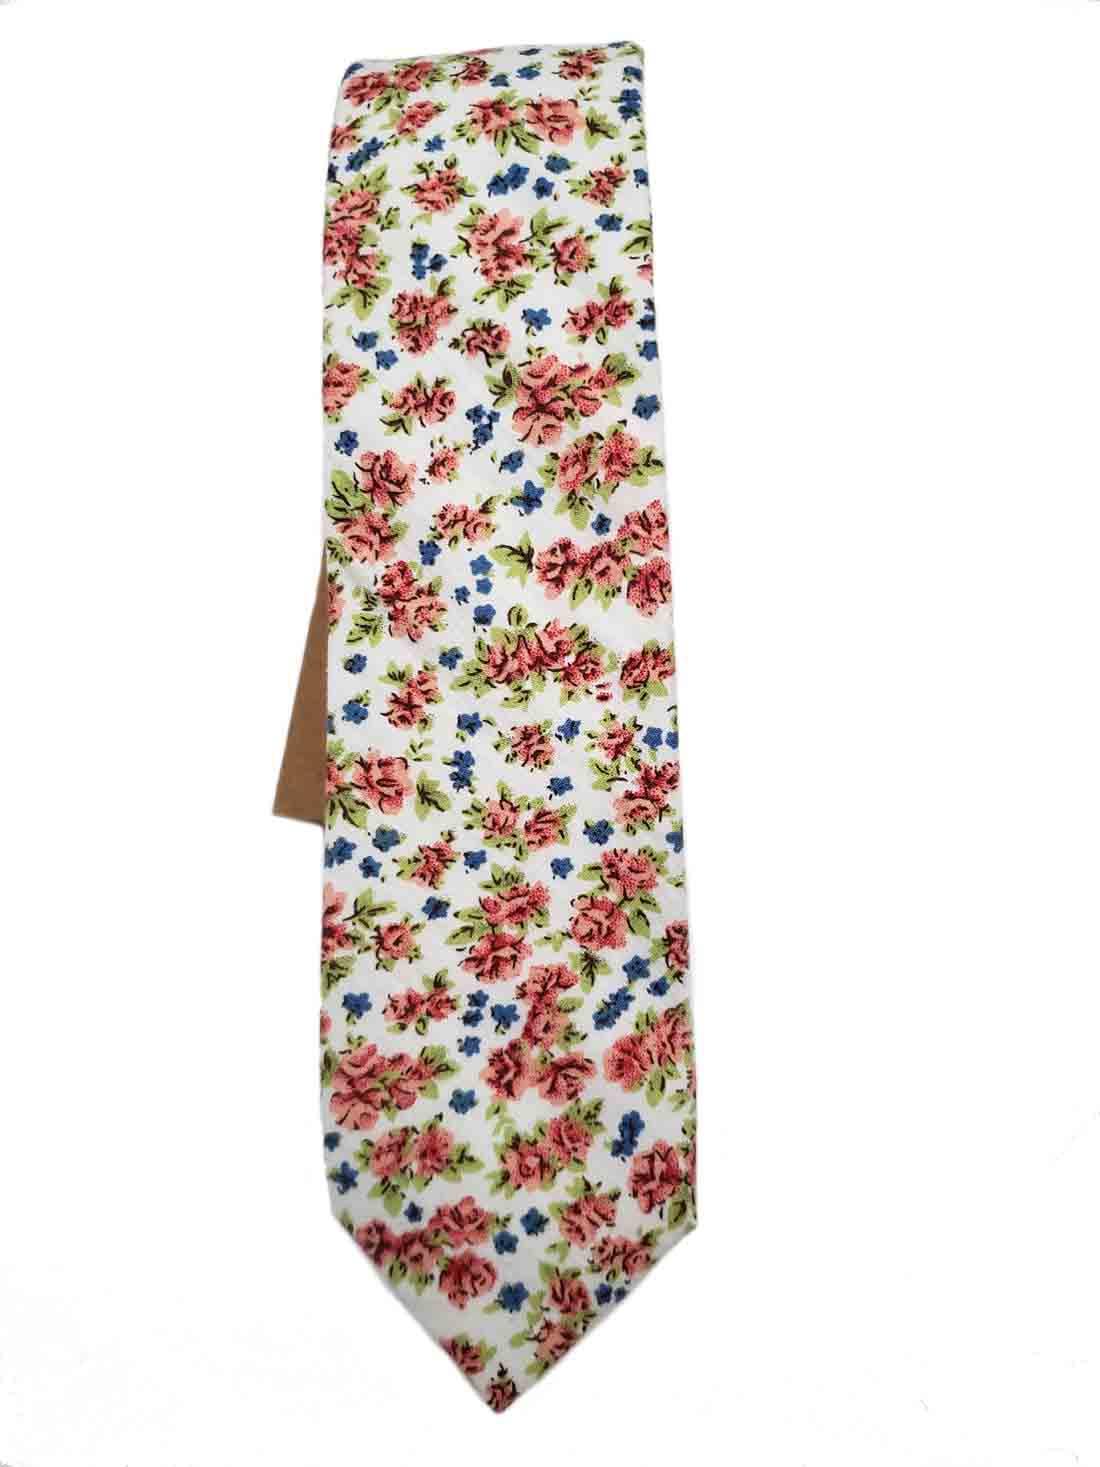 Floral Cotton Tie Narrow White Pink Green Blue Men's